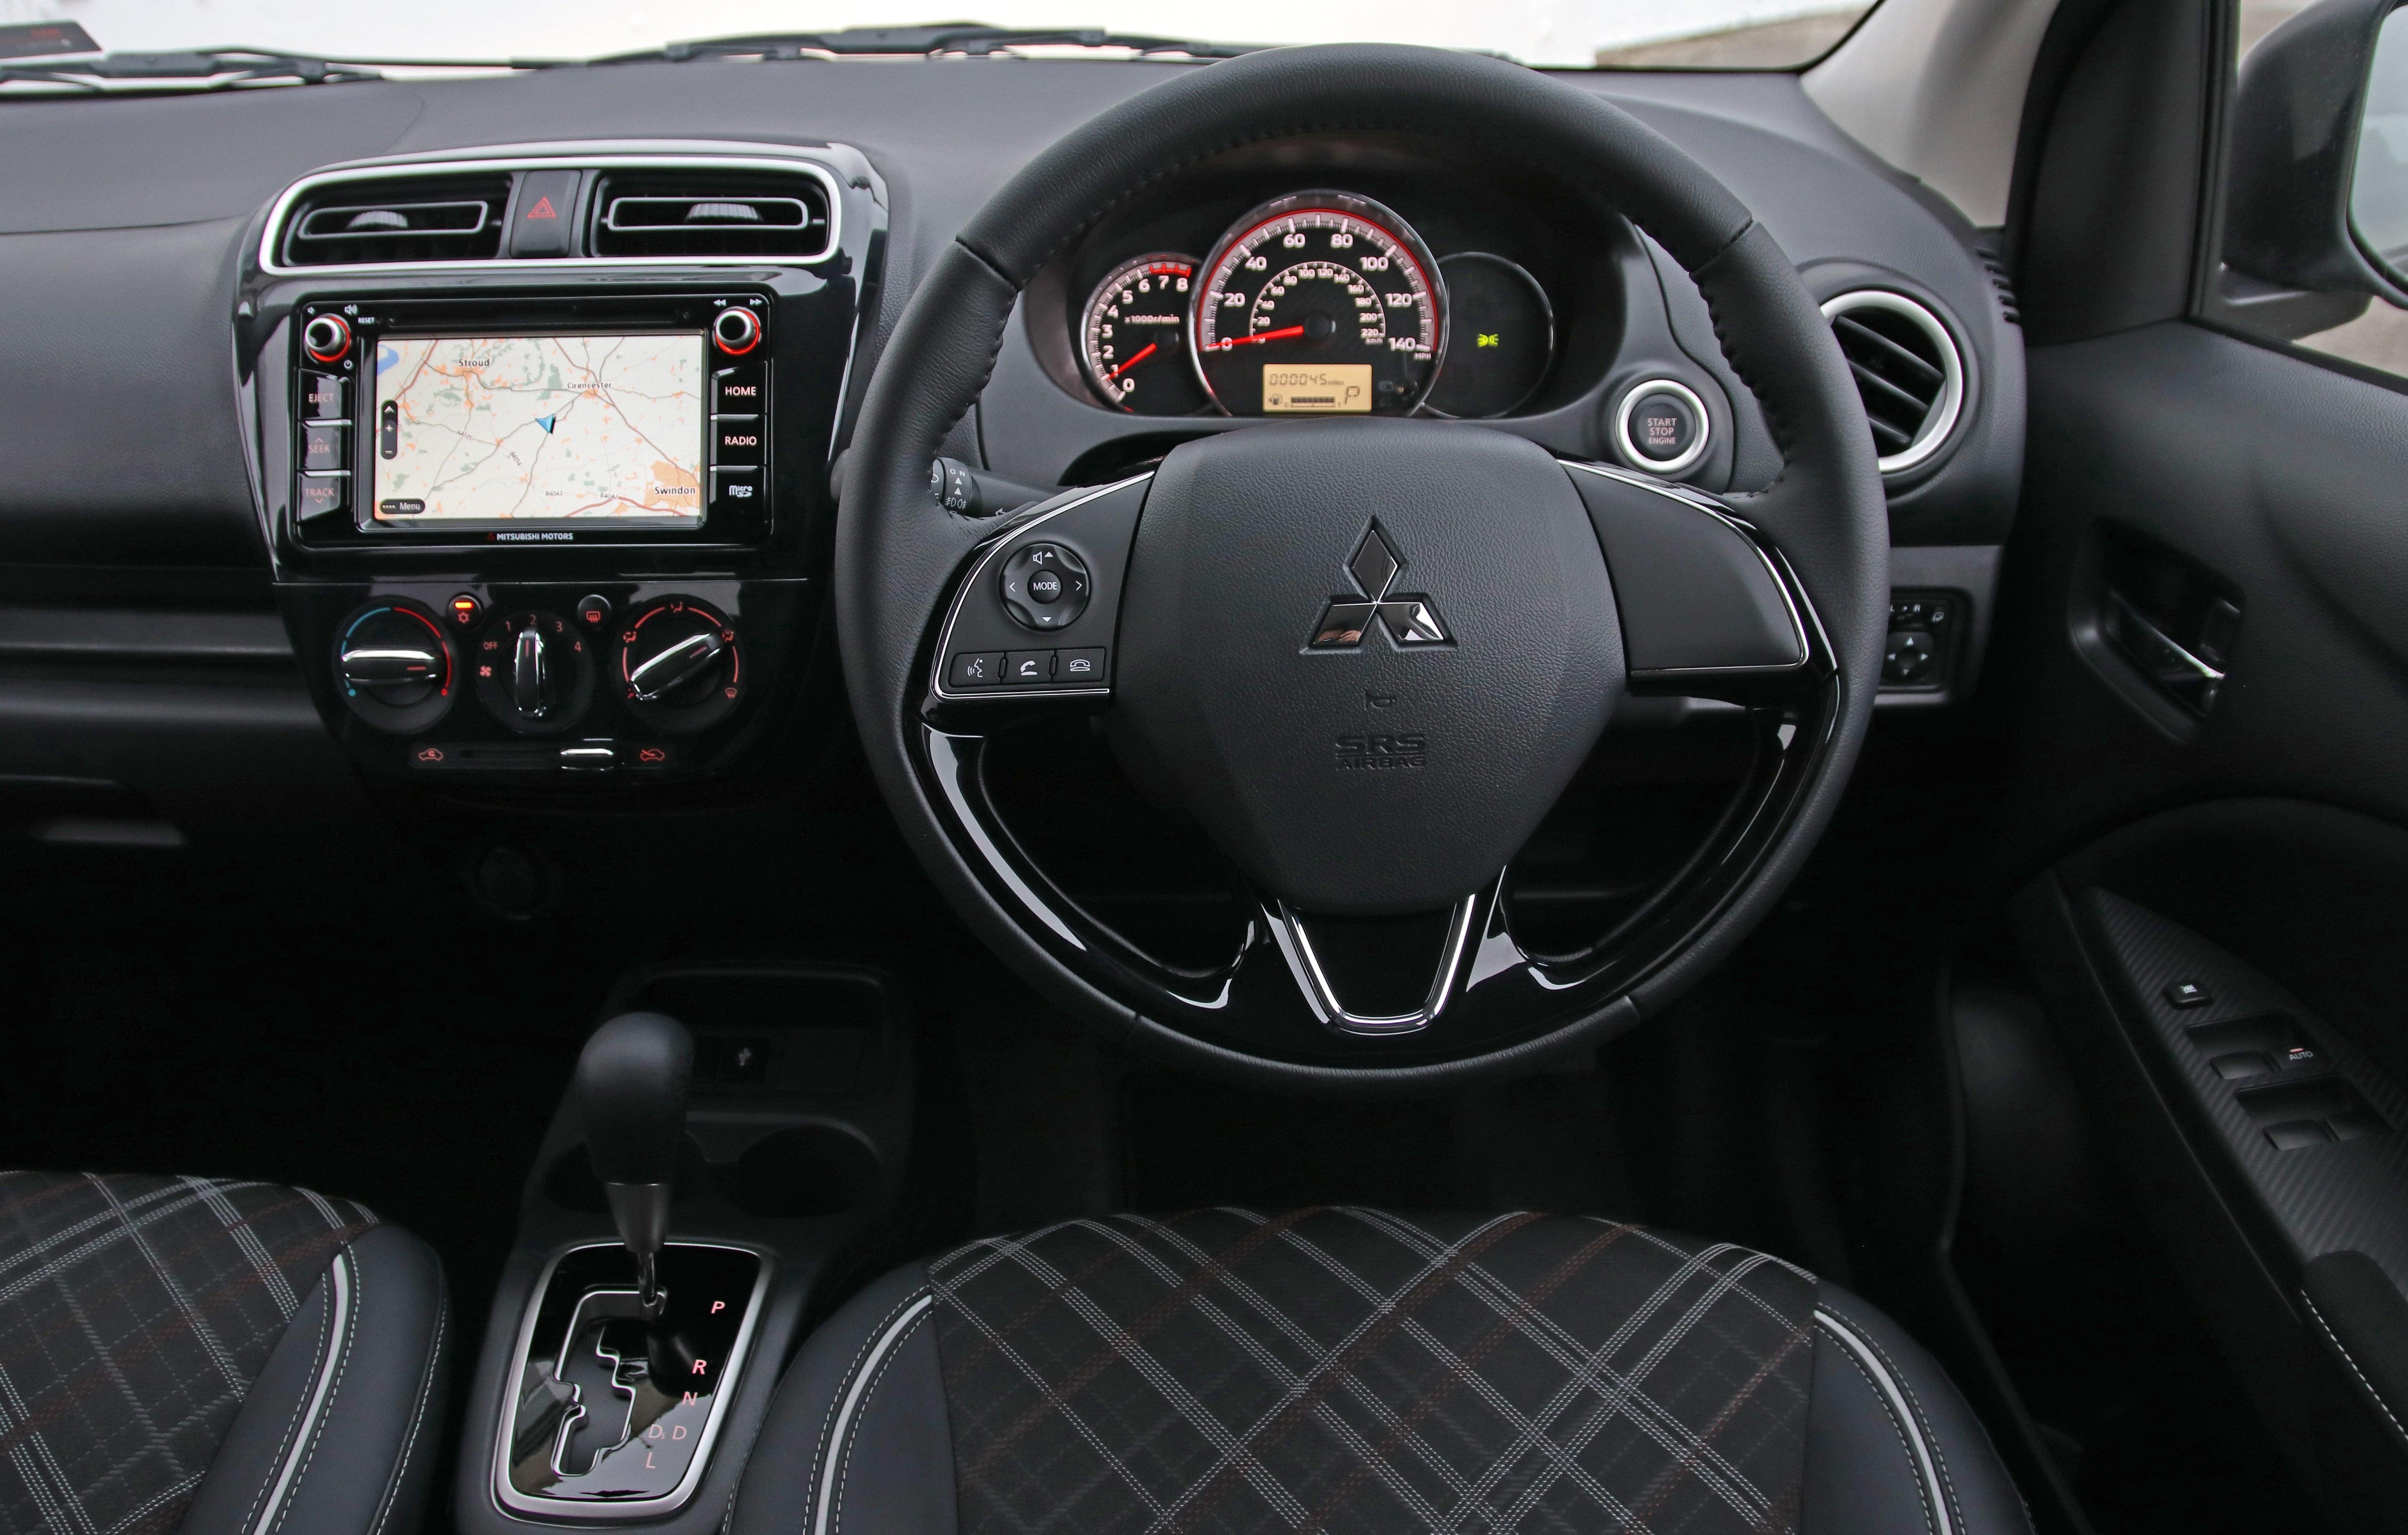 Mitsubishi Mirage front interior